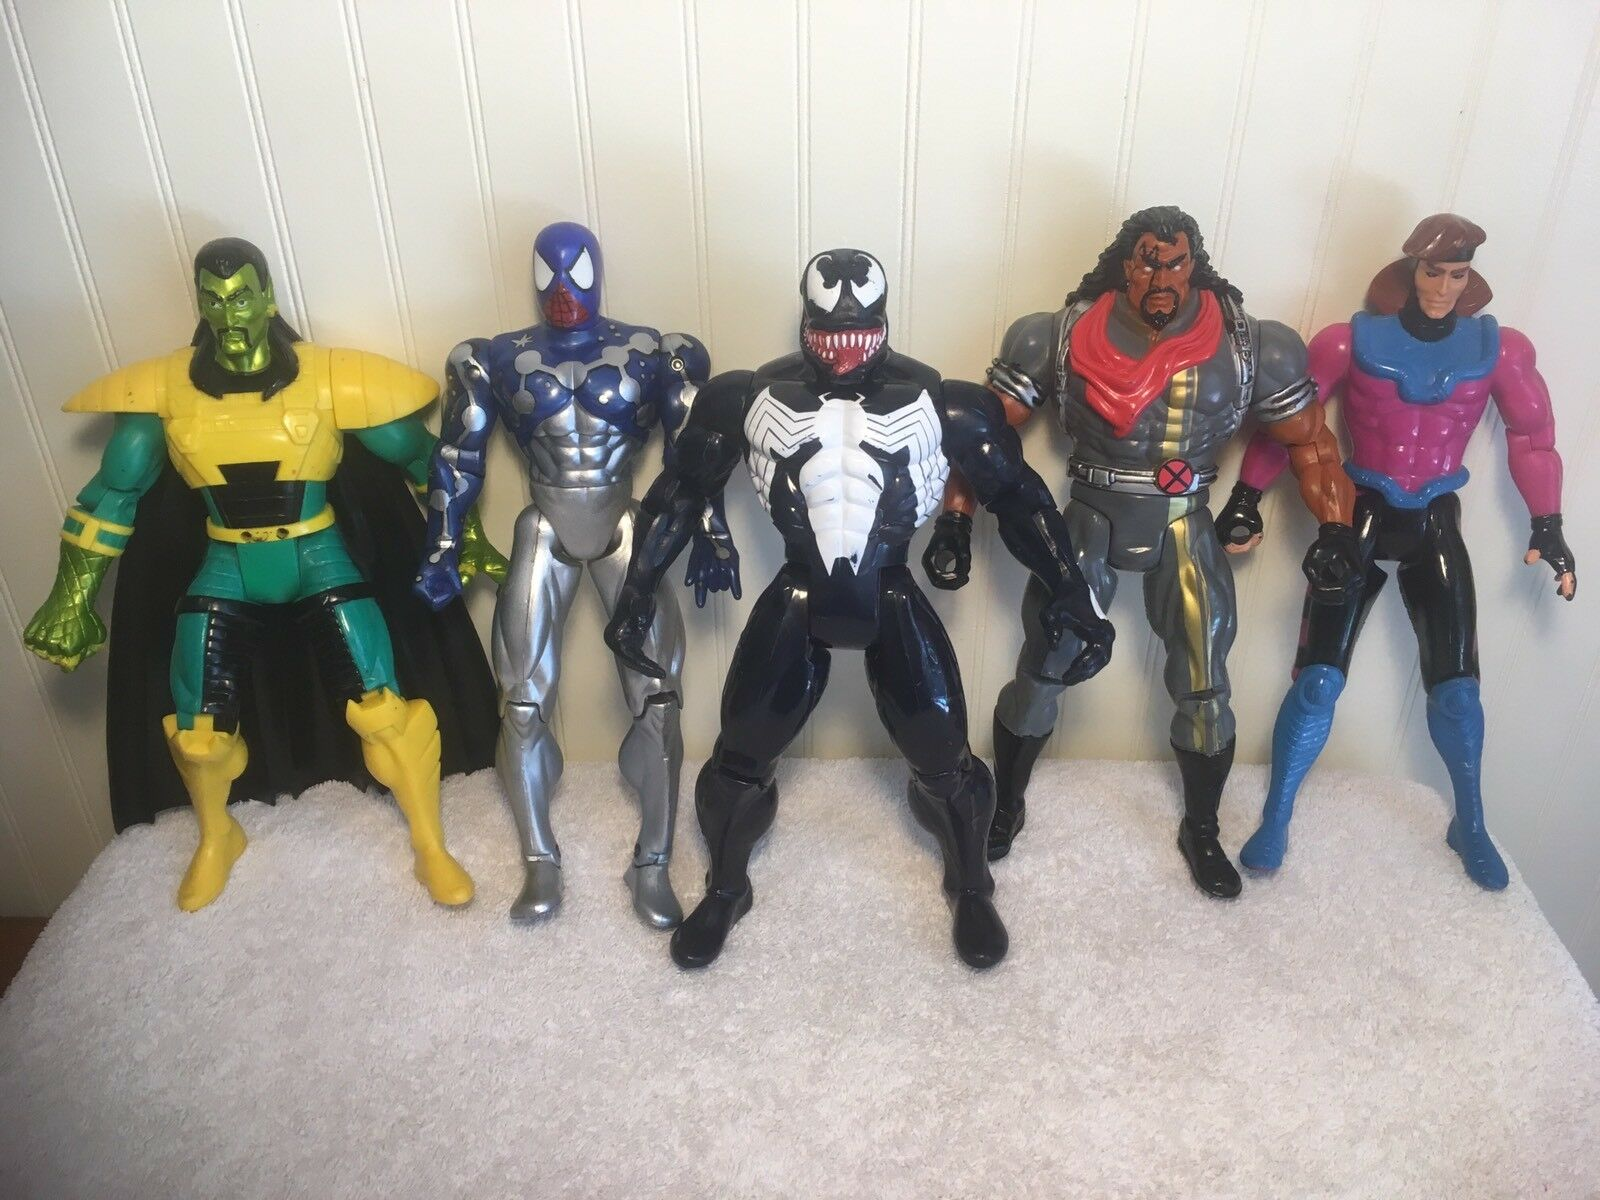 Marvel - action - figur viel gift kosmische spiderman - gambit bischof mandarin - 10